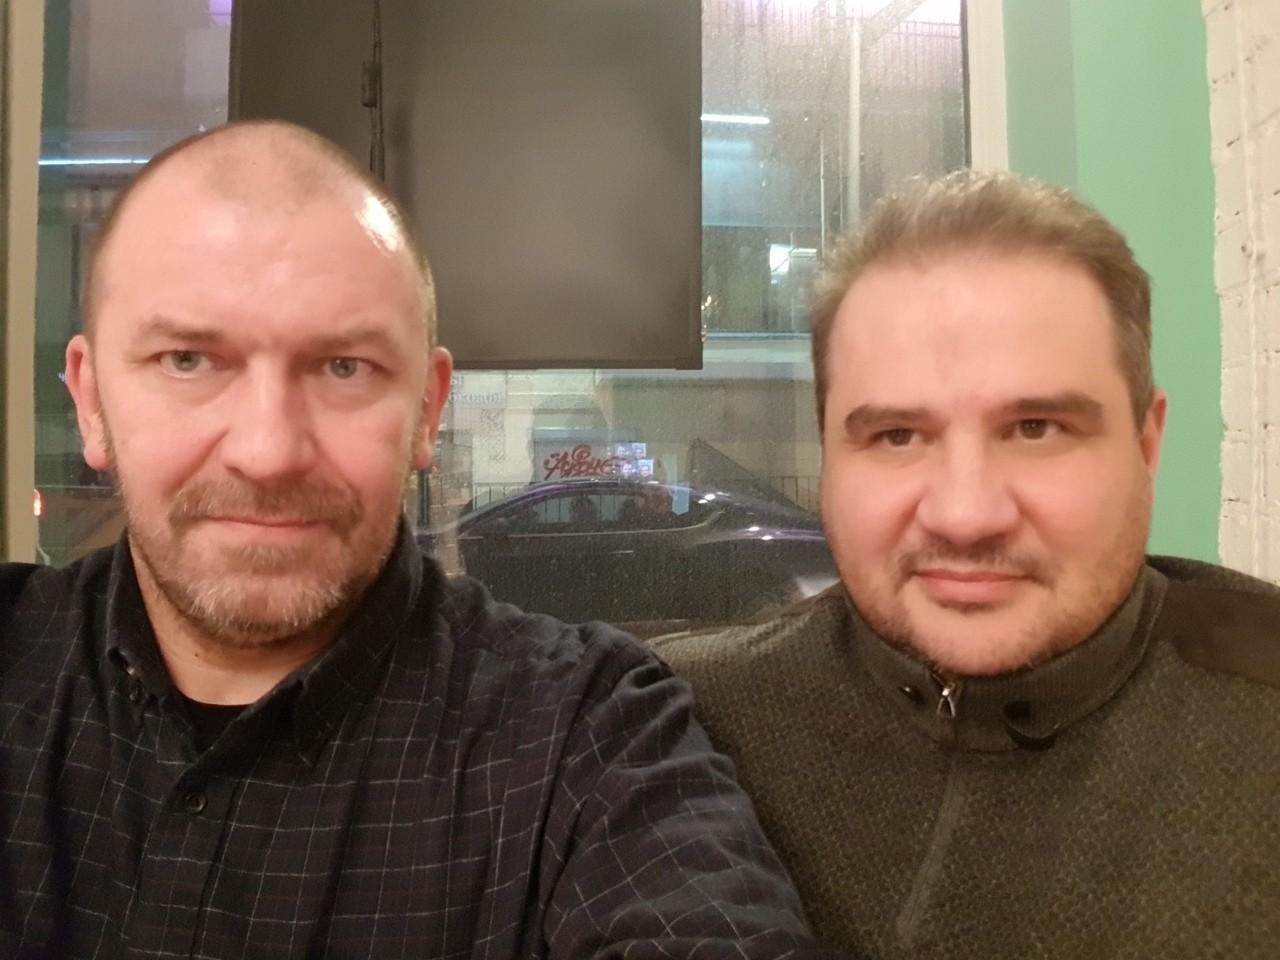 "<p>Александр Казаков (слева) и Александр Тимофеев (справа). Фото: © VK/<a href=""https://vk.com/alekazakov"" target=""_self"">Александр Казаков</a></p>"